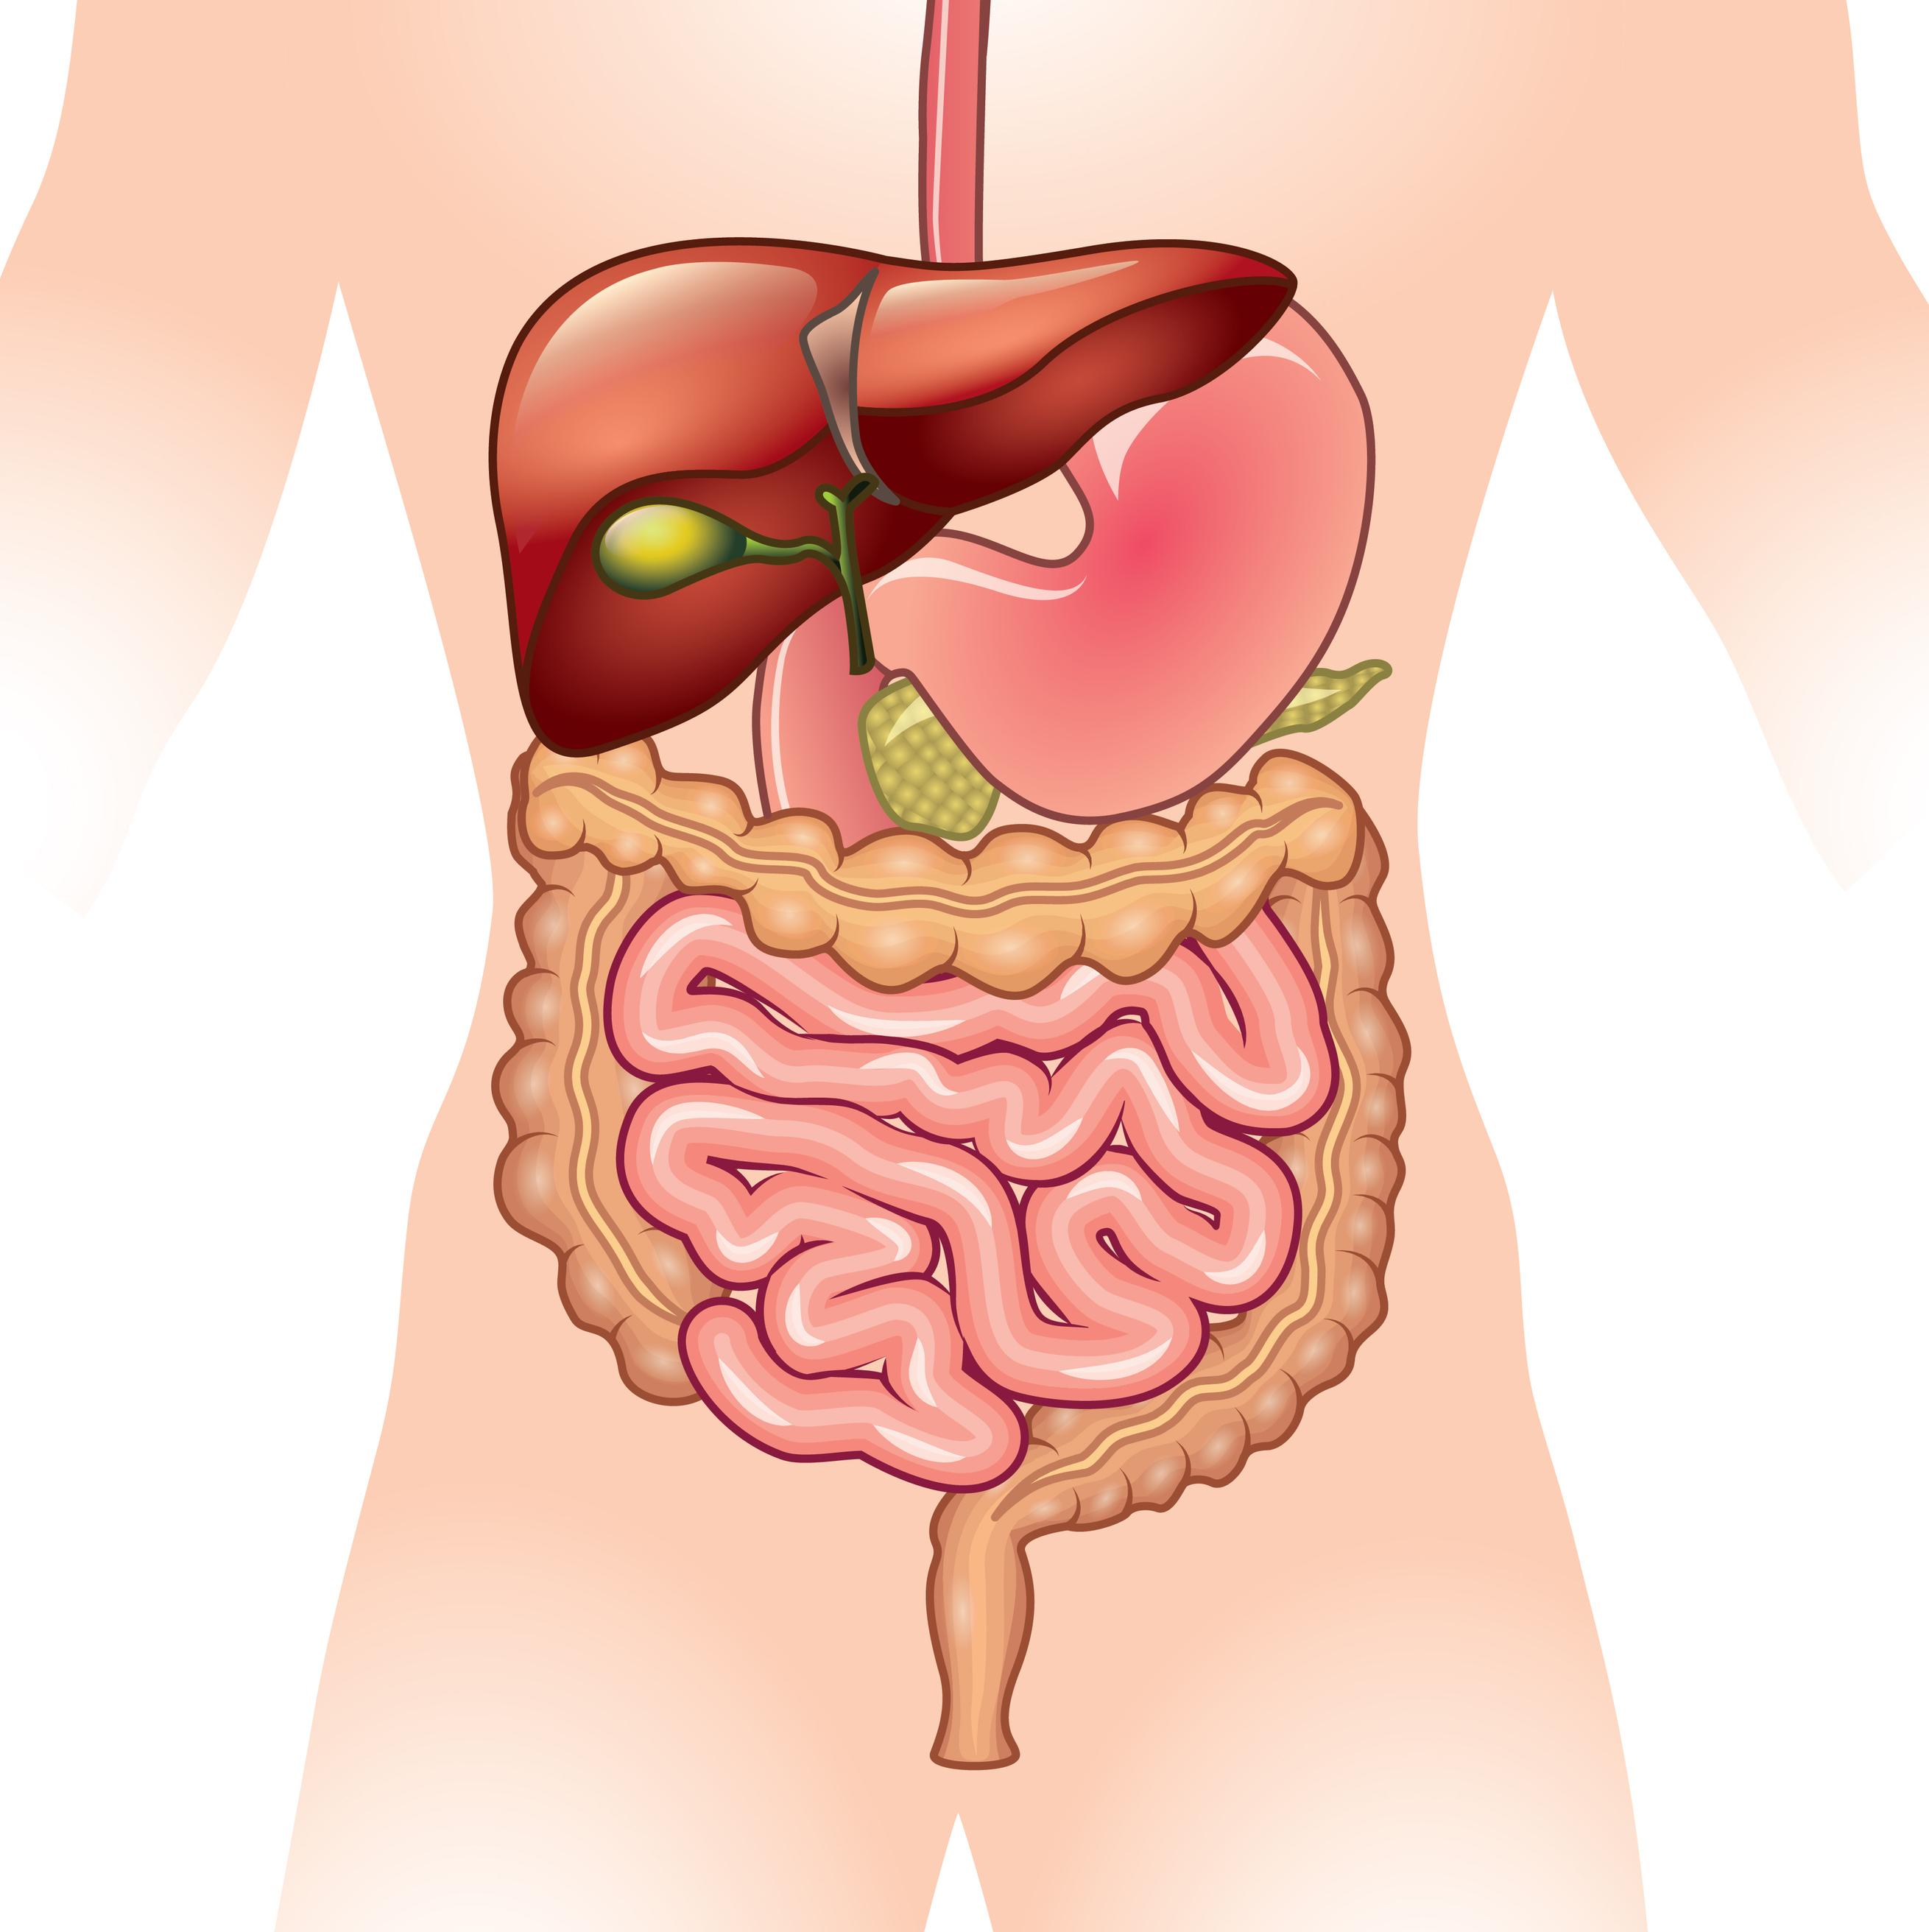 Alverín a simeticon v liečbe IBS